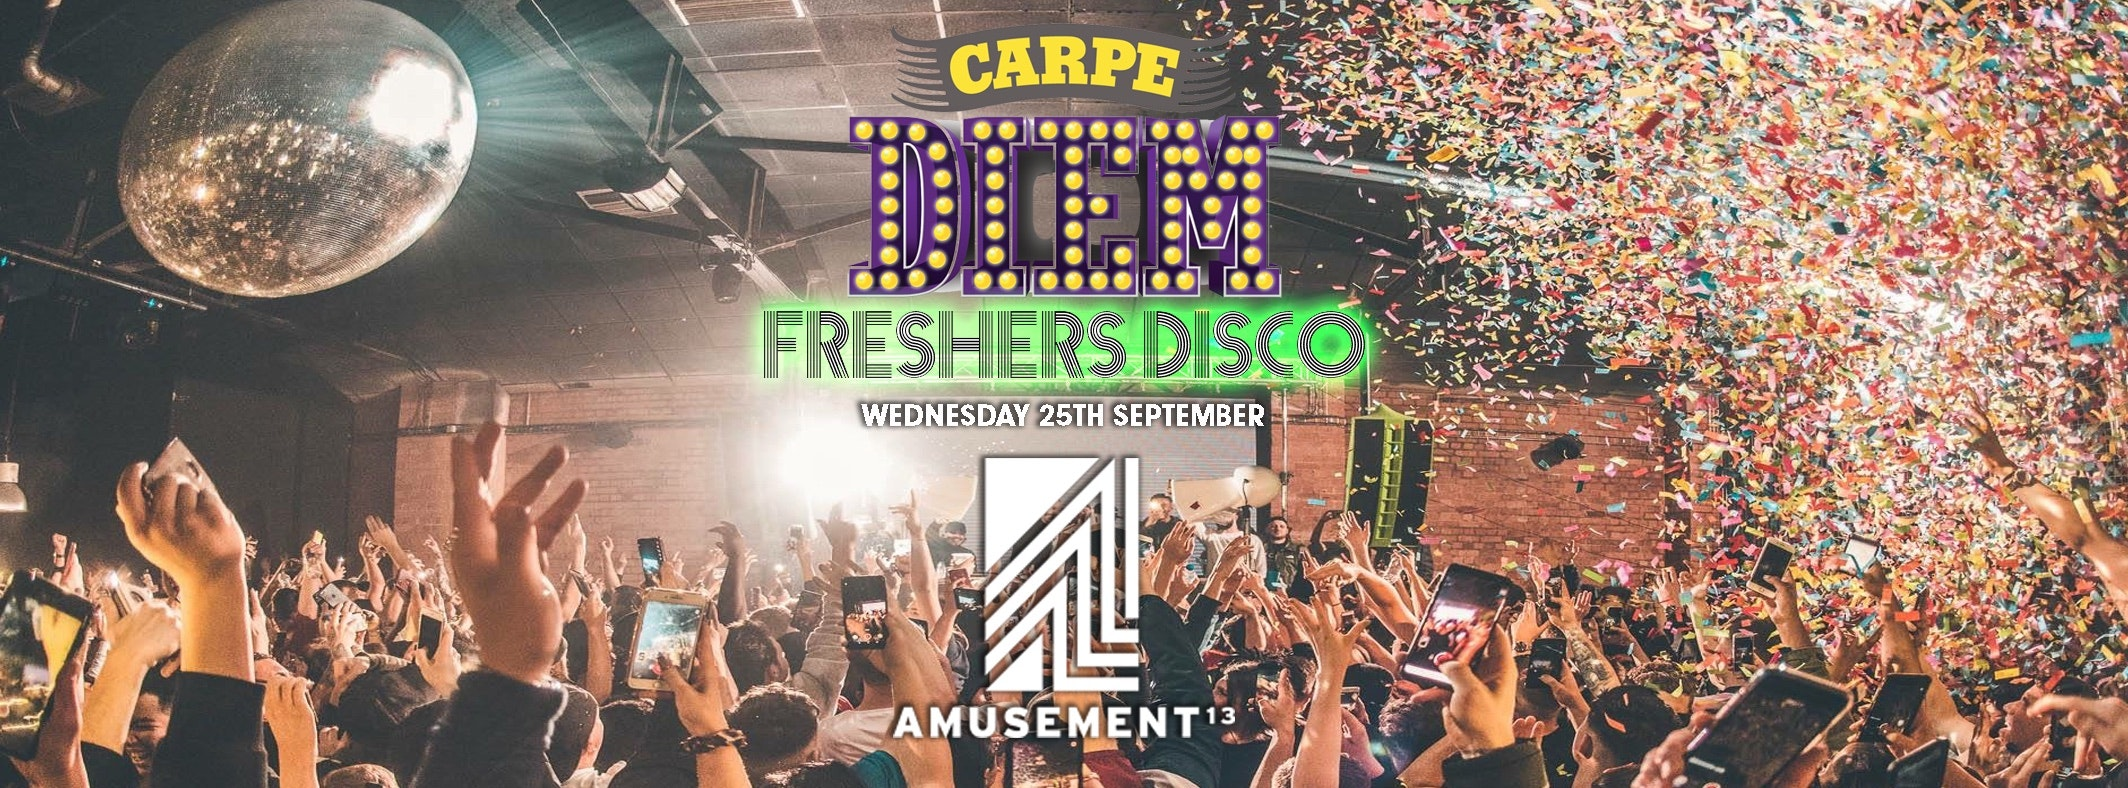 Carpe Diem – The Freshers Disco – Birmingham – Amusement 13